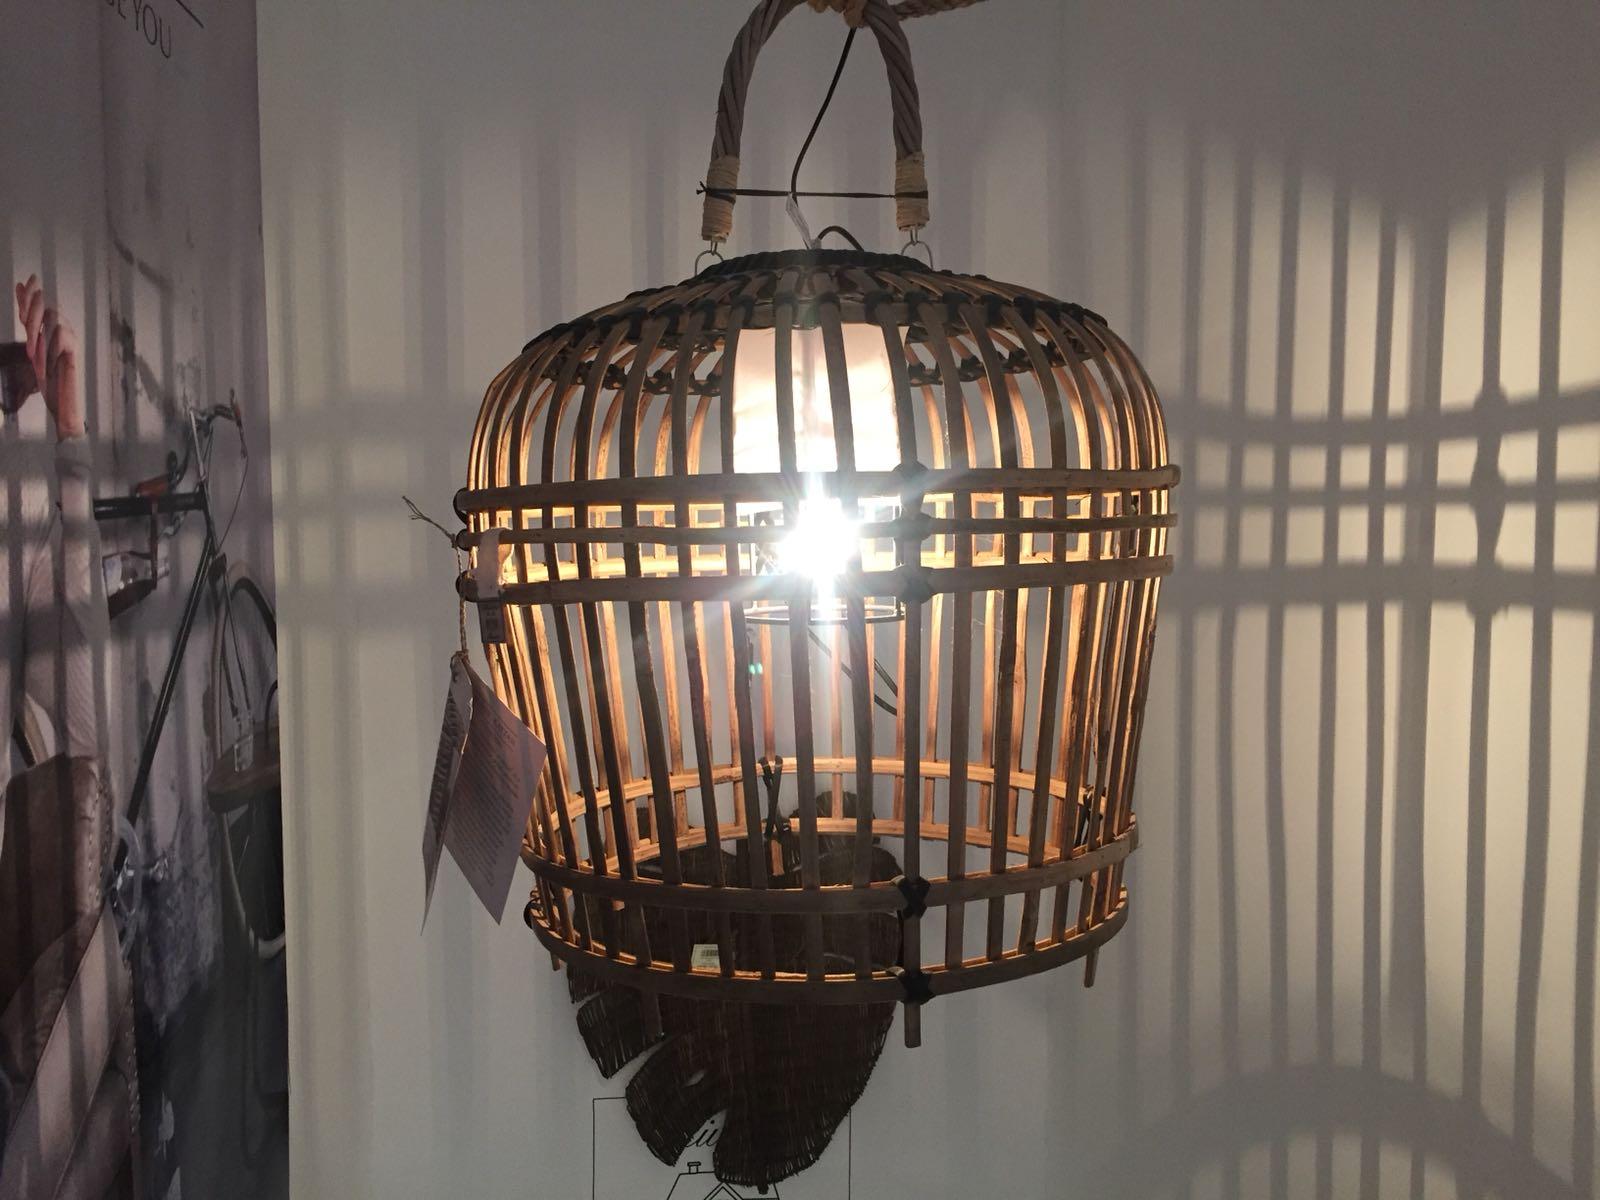 Riviera Maison Lampen : Riviera maison san carlos hanging lamp l: cristopher worthland